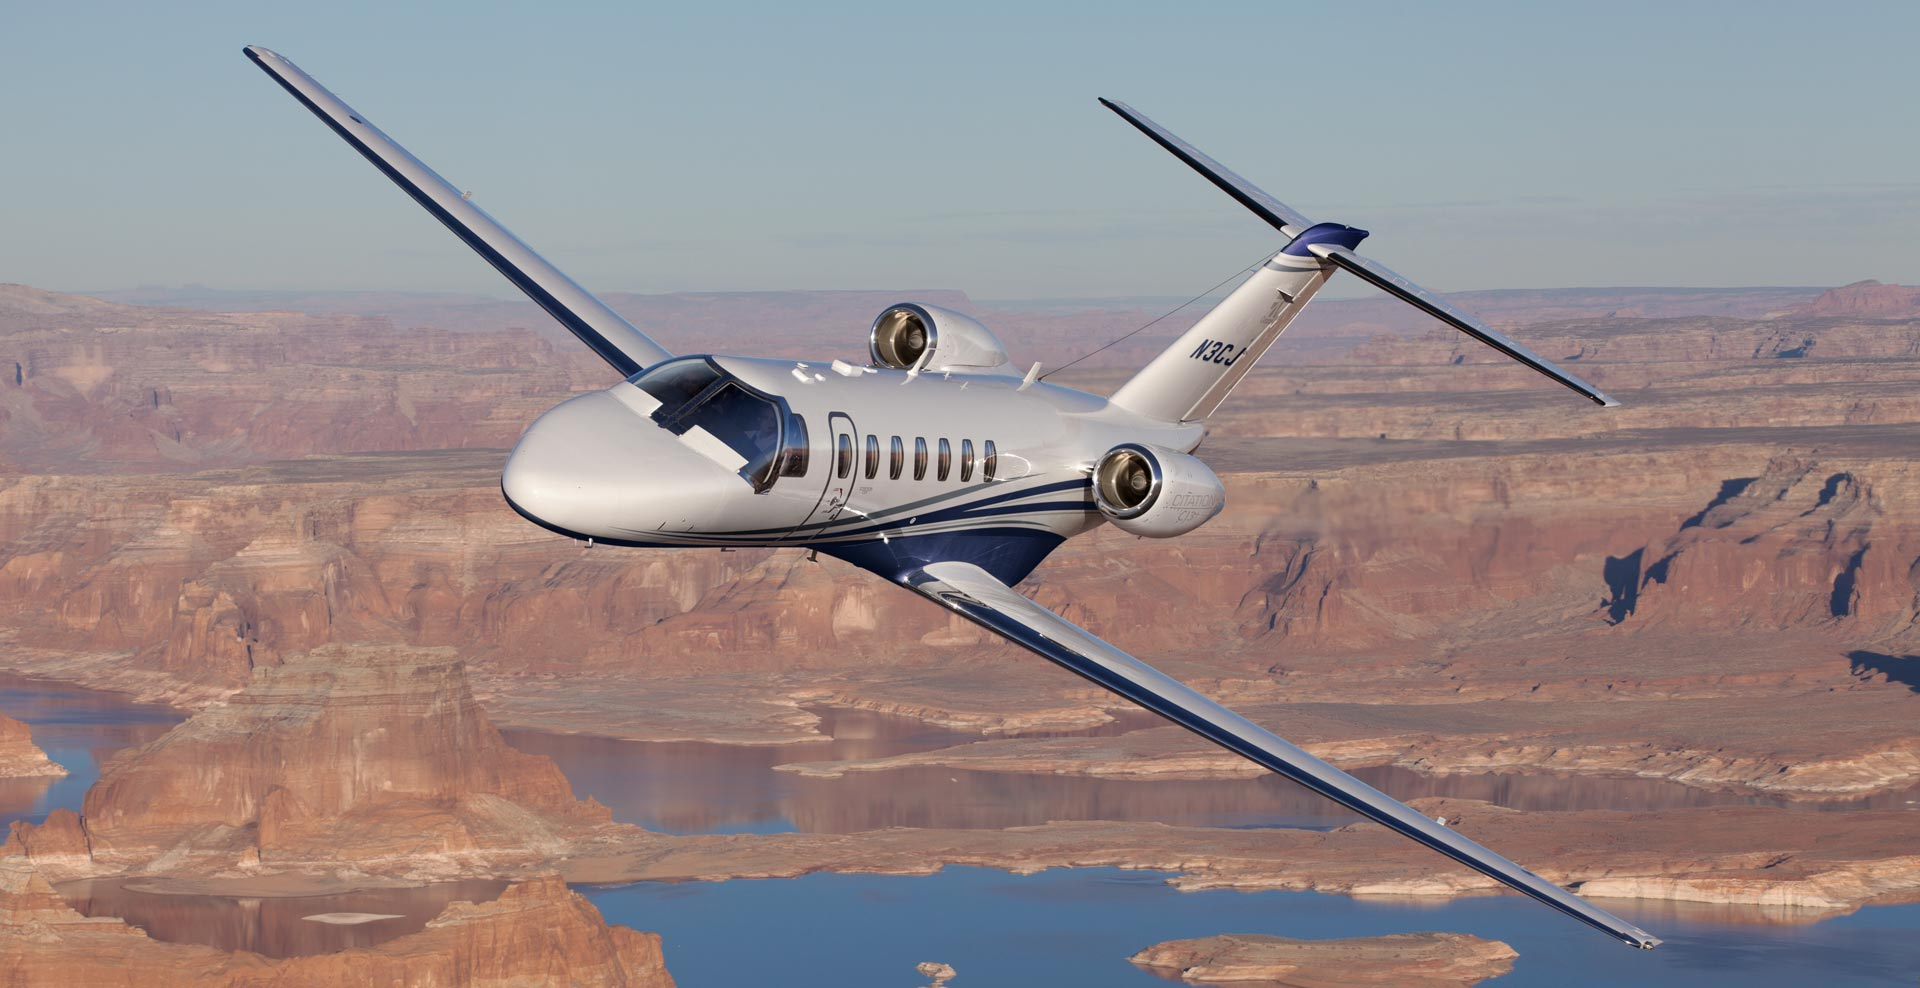 business-aircraft-avionics-installations-upgrades-repairs